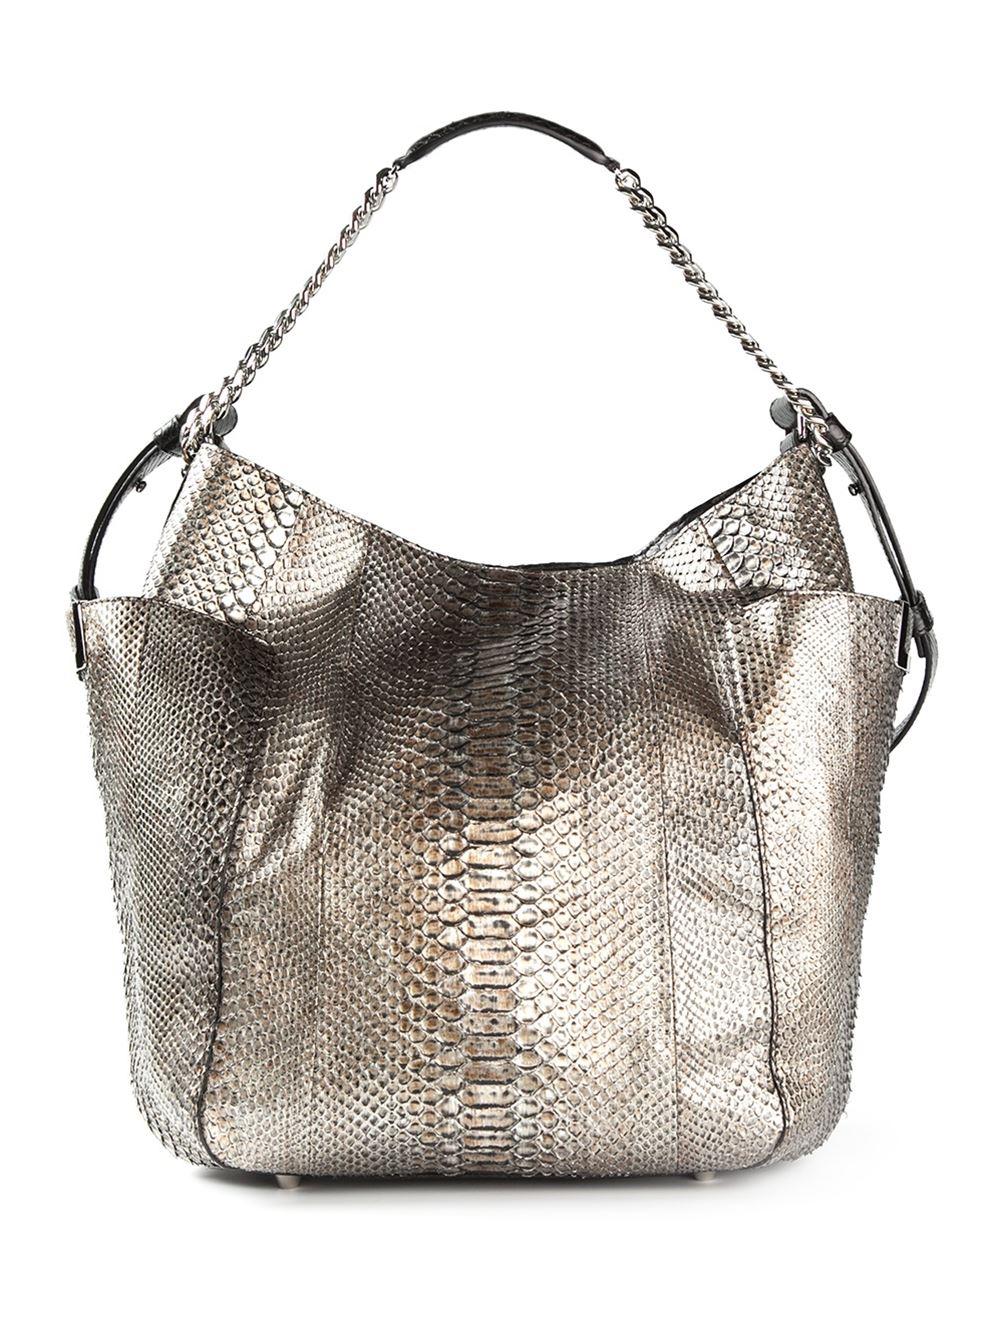 Jimmy Choo Anna Shoulder Bag In Metallic Brown Lyst